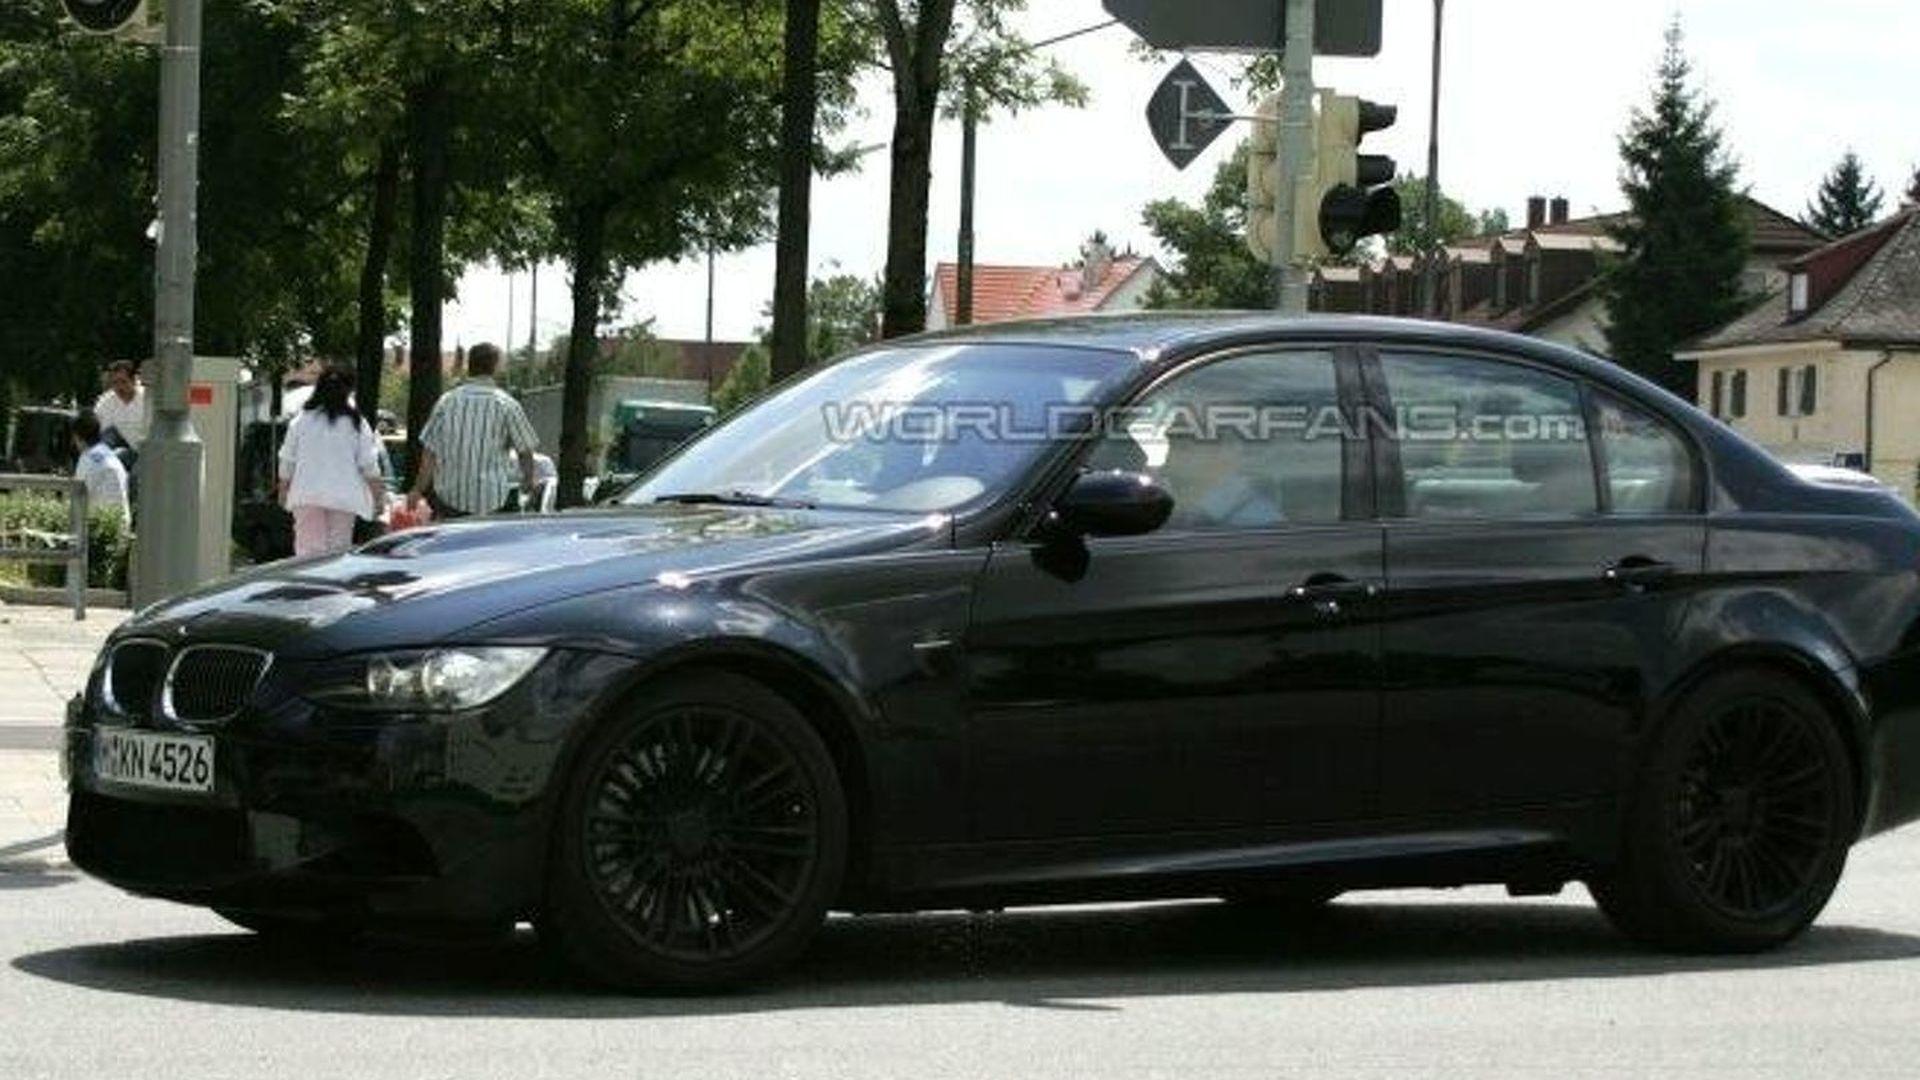 BMW M Door Sedan Latest Spy Photos - 2007 bmw m3 sedan